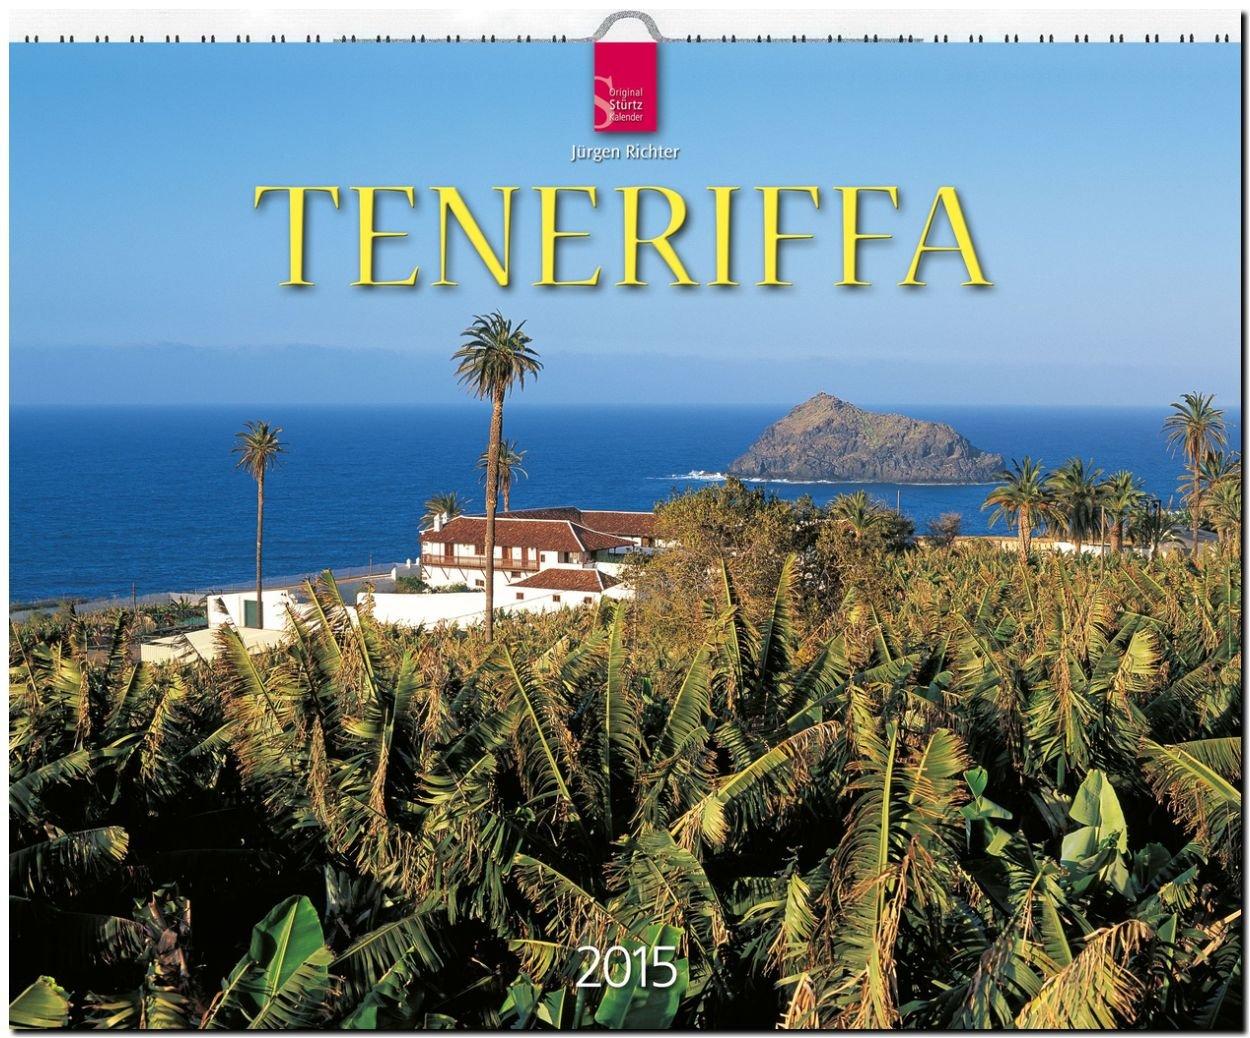 Teneriffa 2015 - Original Stürtz-Kalender - Großformat-Kalender 60 x 48 cm